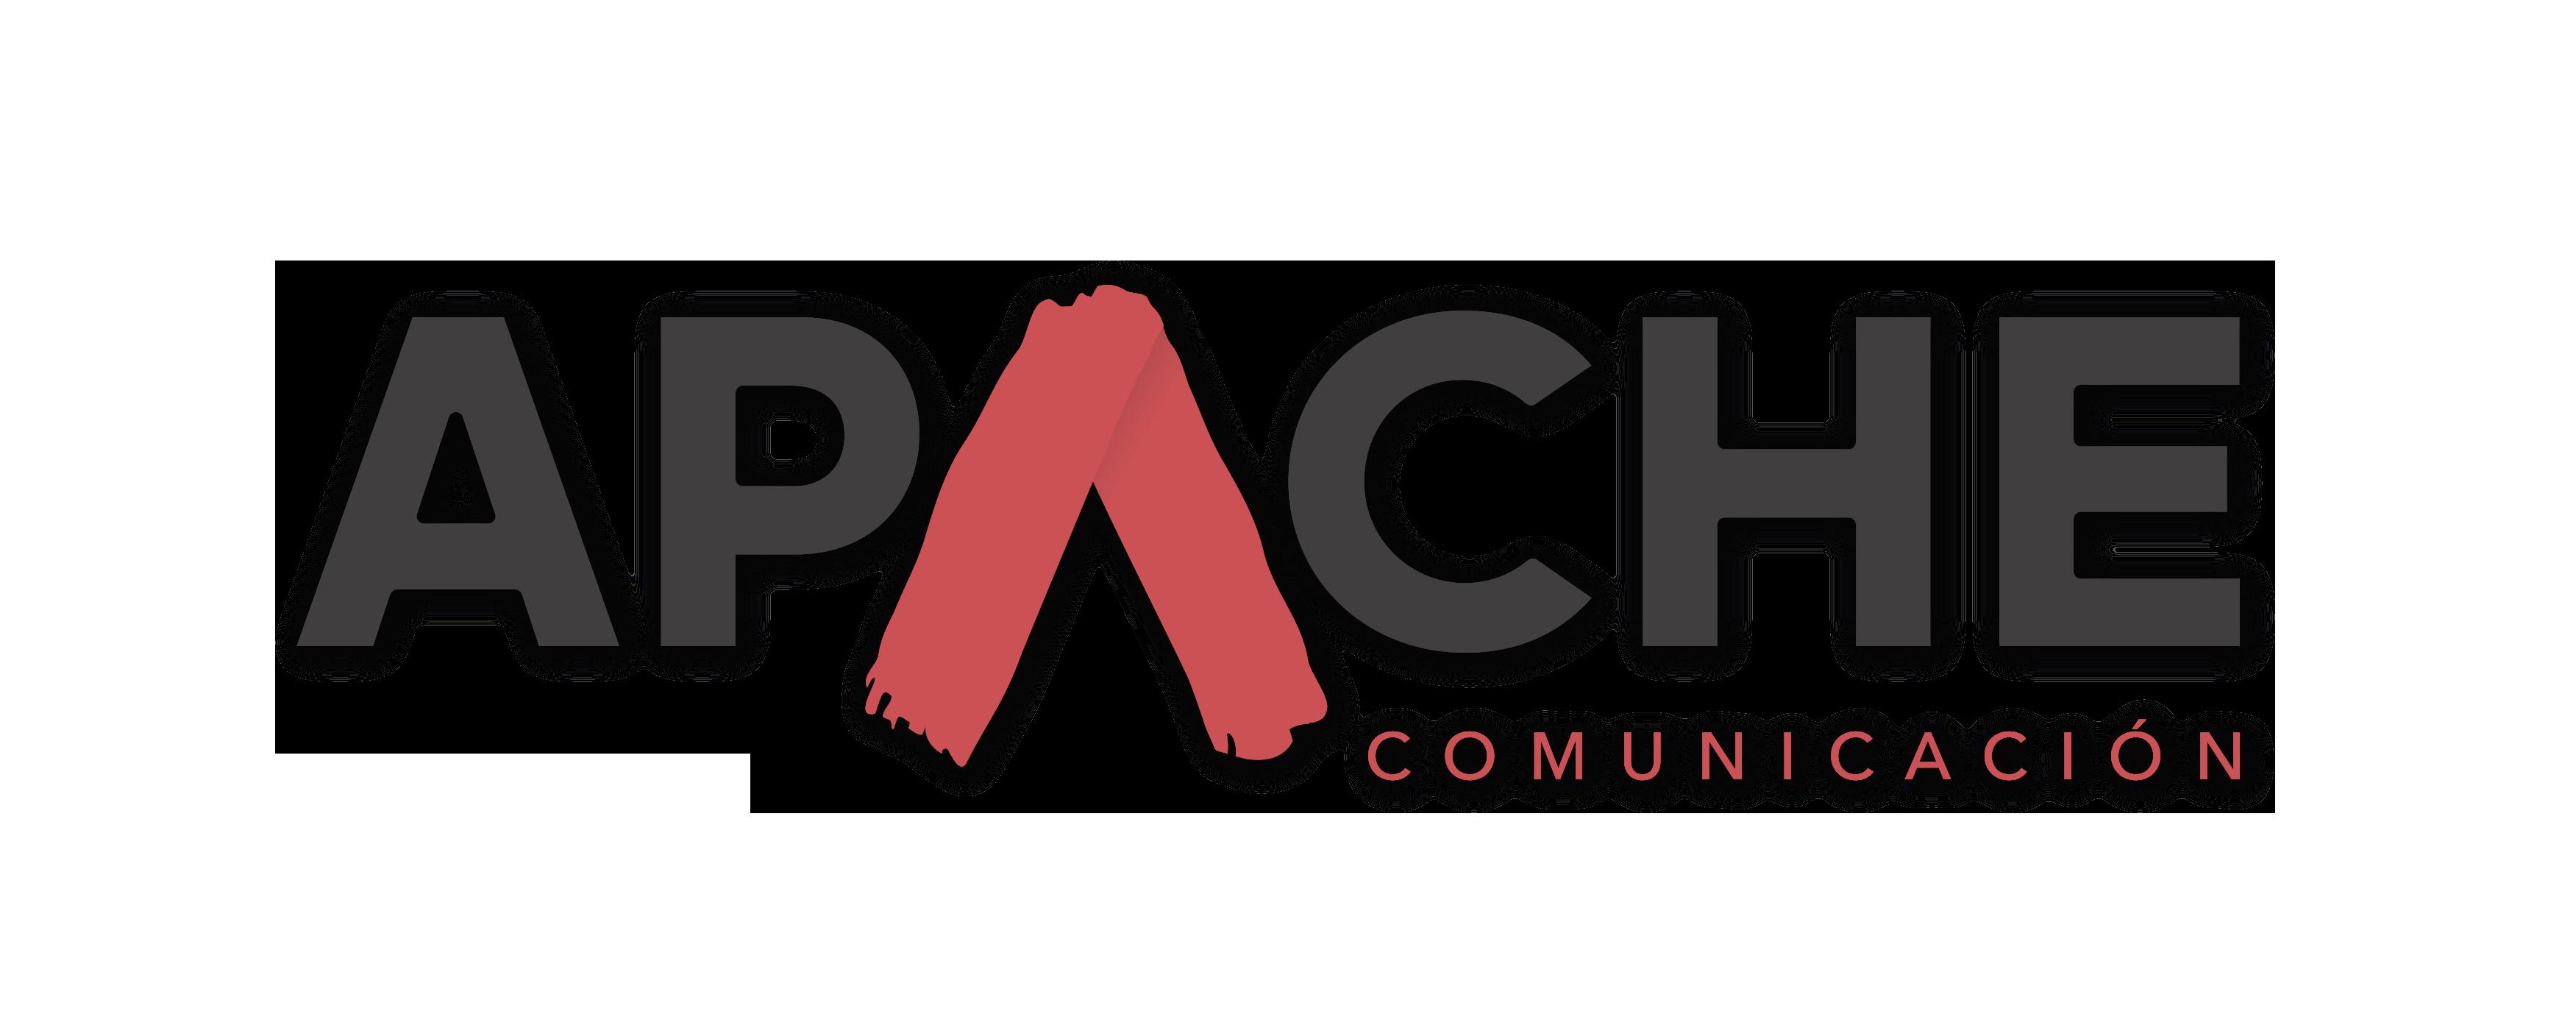 apache comunicacion